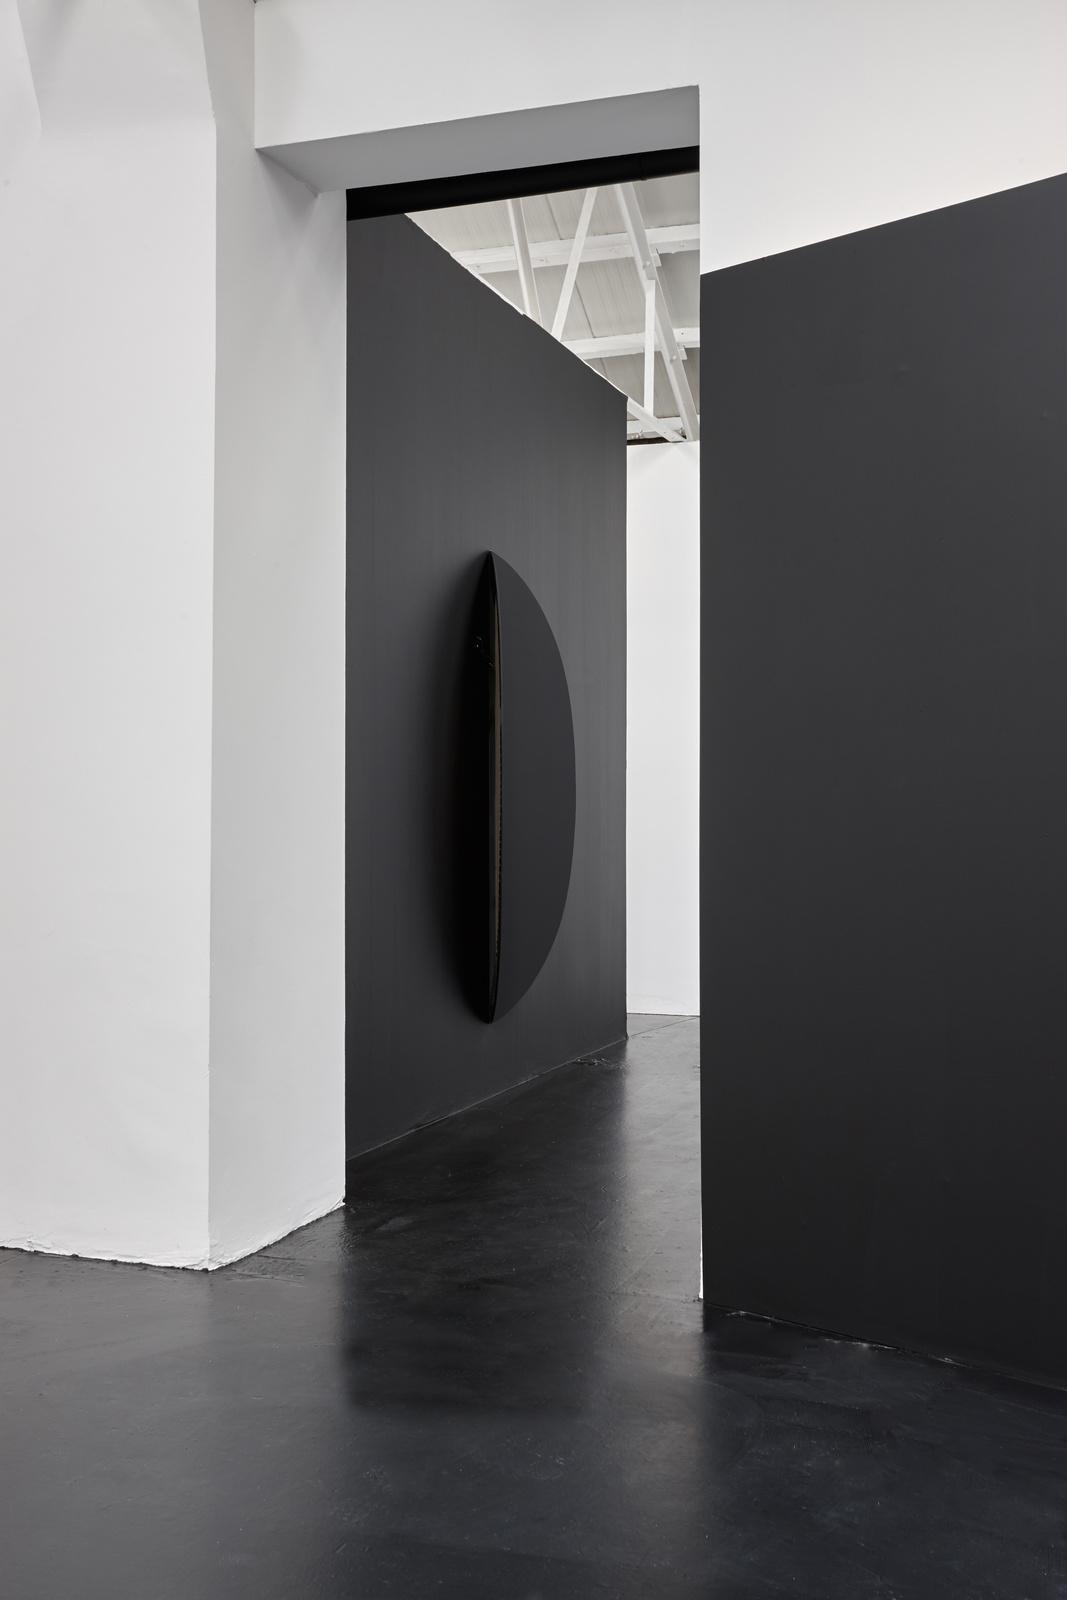 Ryan Estep - 5 - Installation View IV